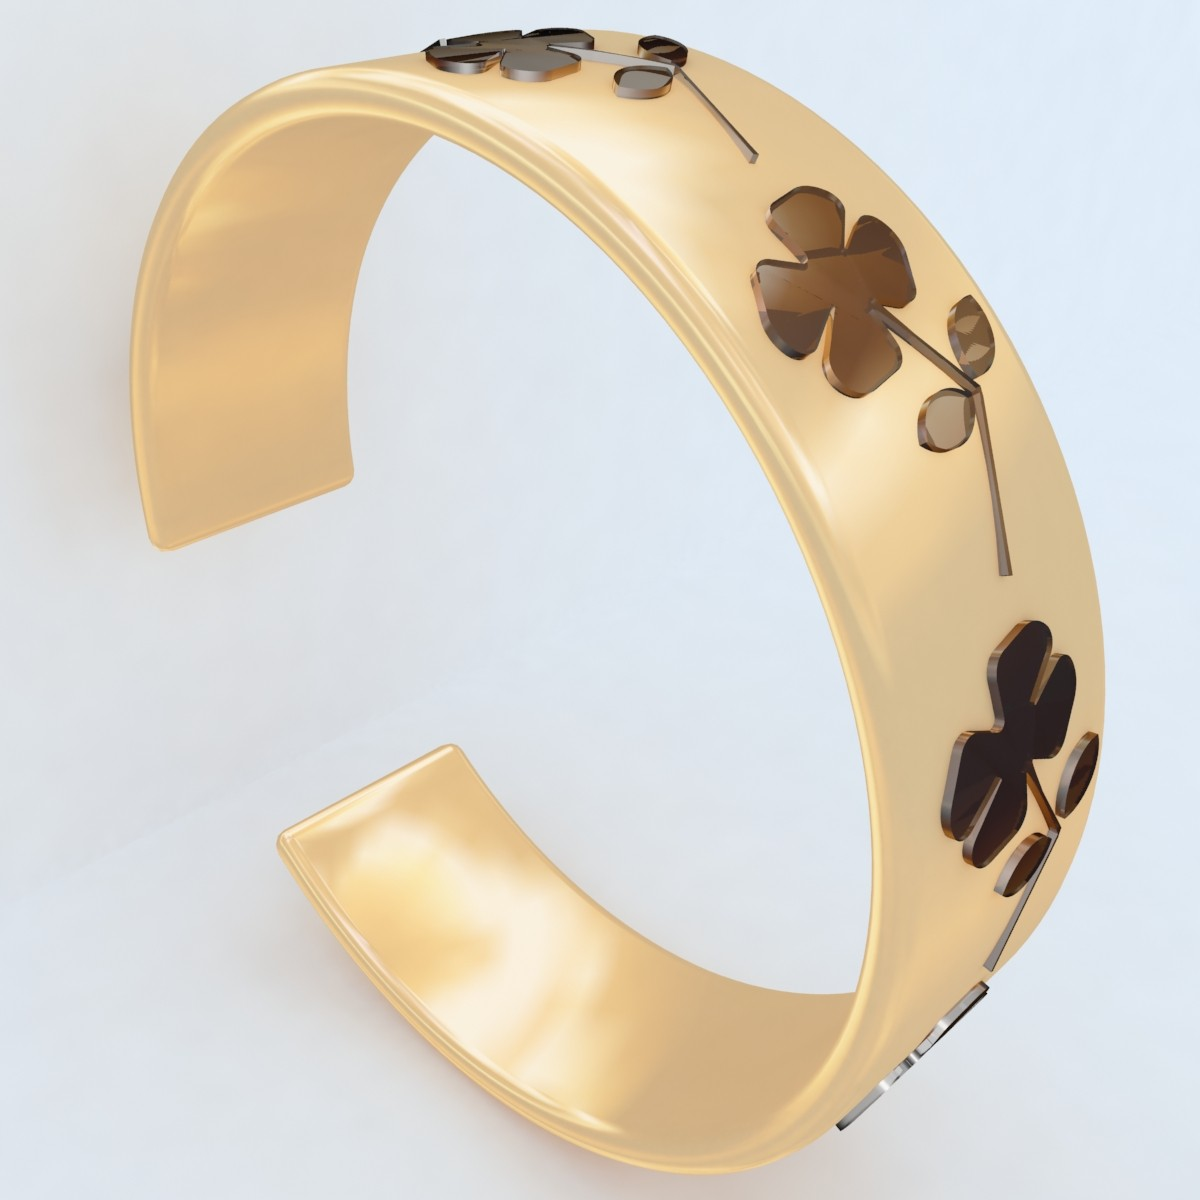 clover wristband a.jpg